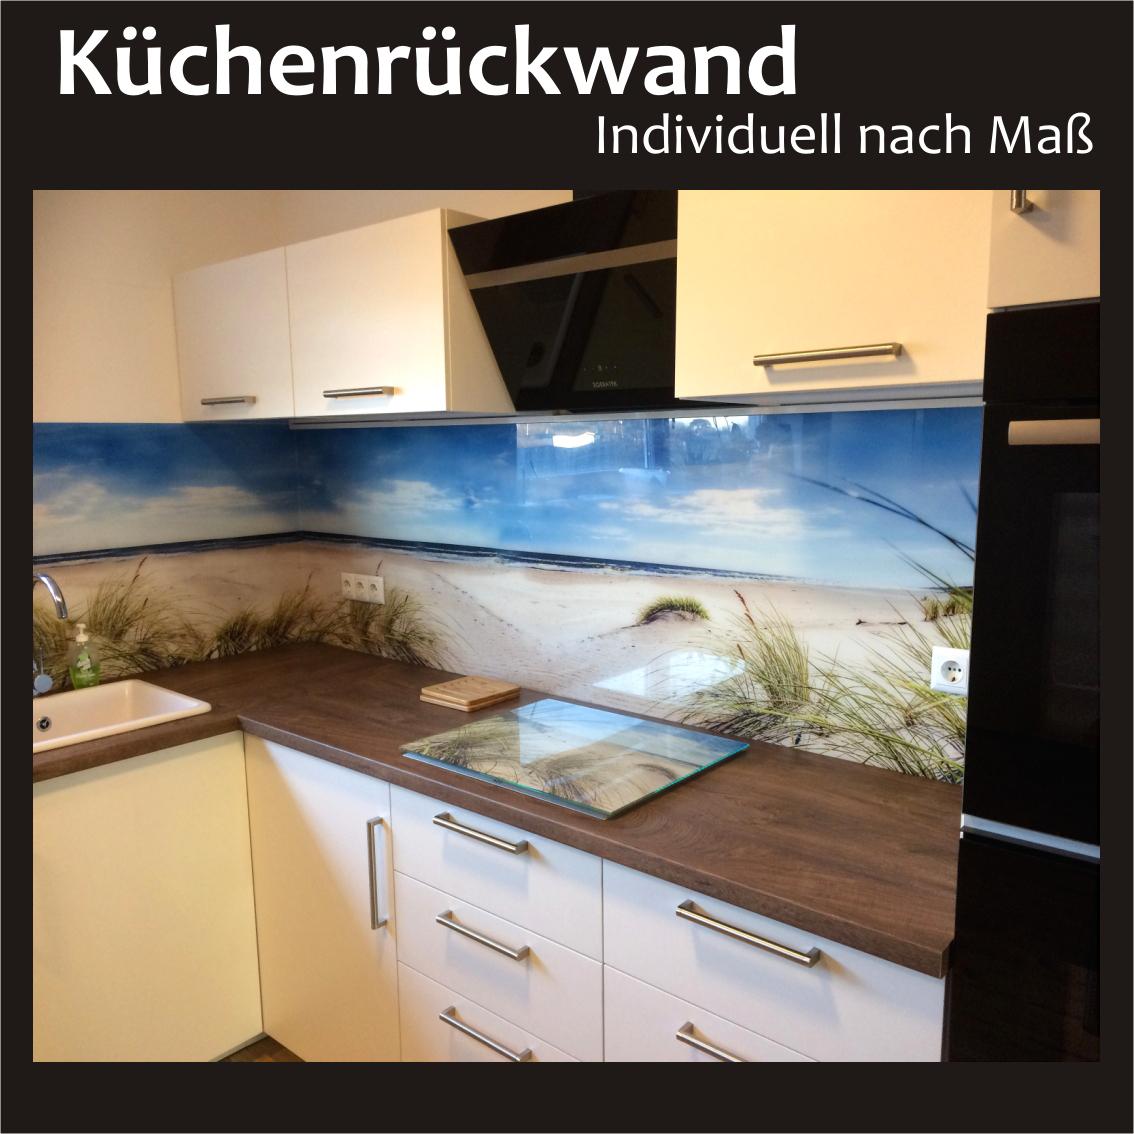 Küchenrückwand nach Maß - Küchenrückwand, Fliesenspiegel, Spritzschutz